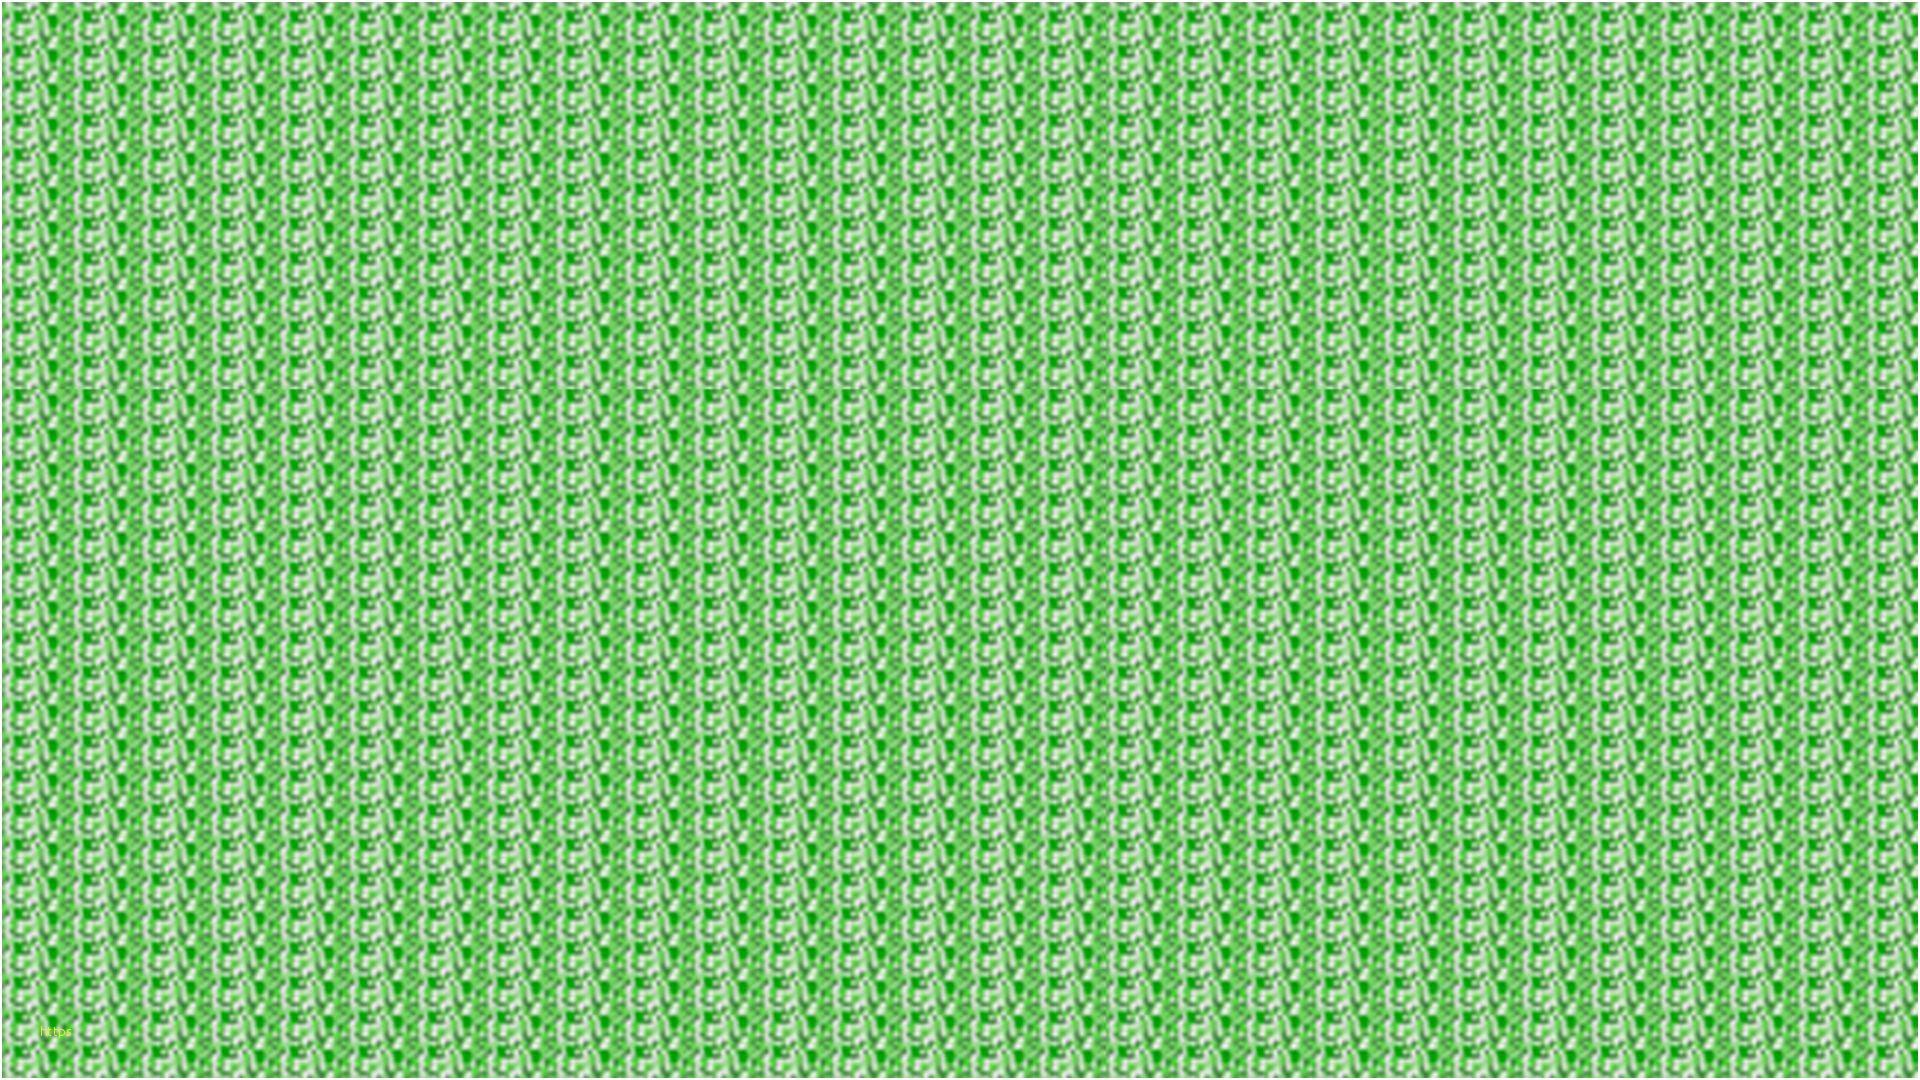 Minecraft Creeper Wallpaper Best Of Minecraft Wallpaper.